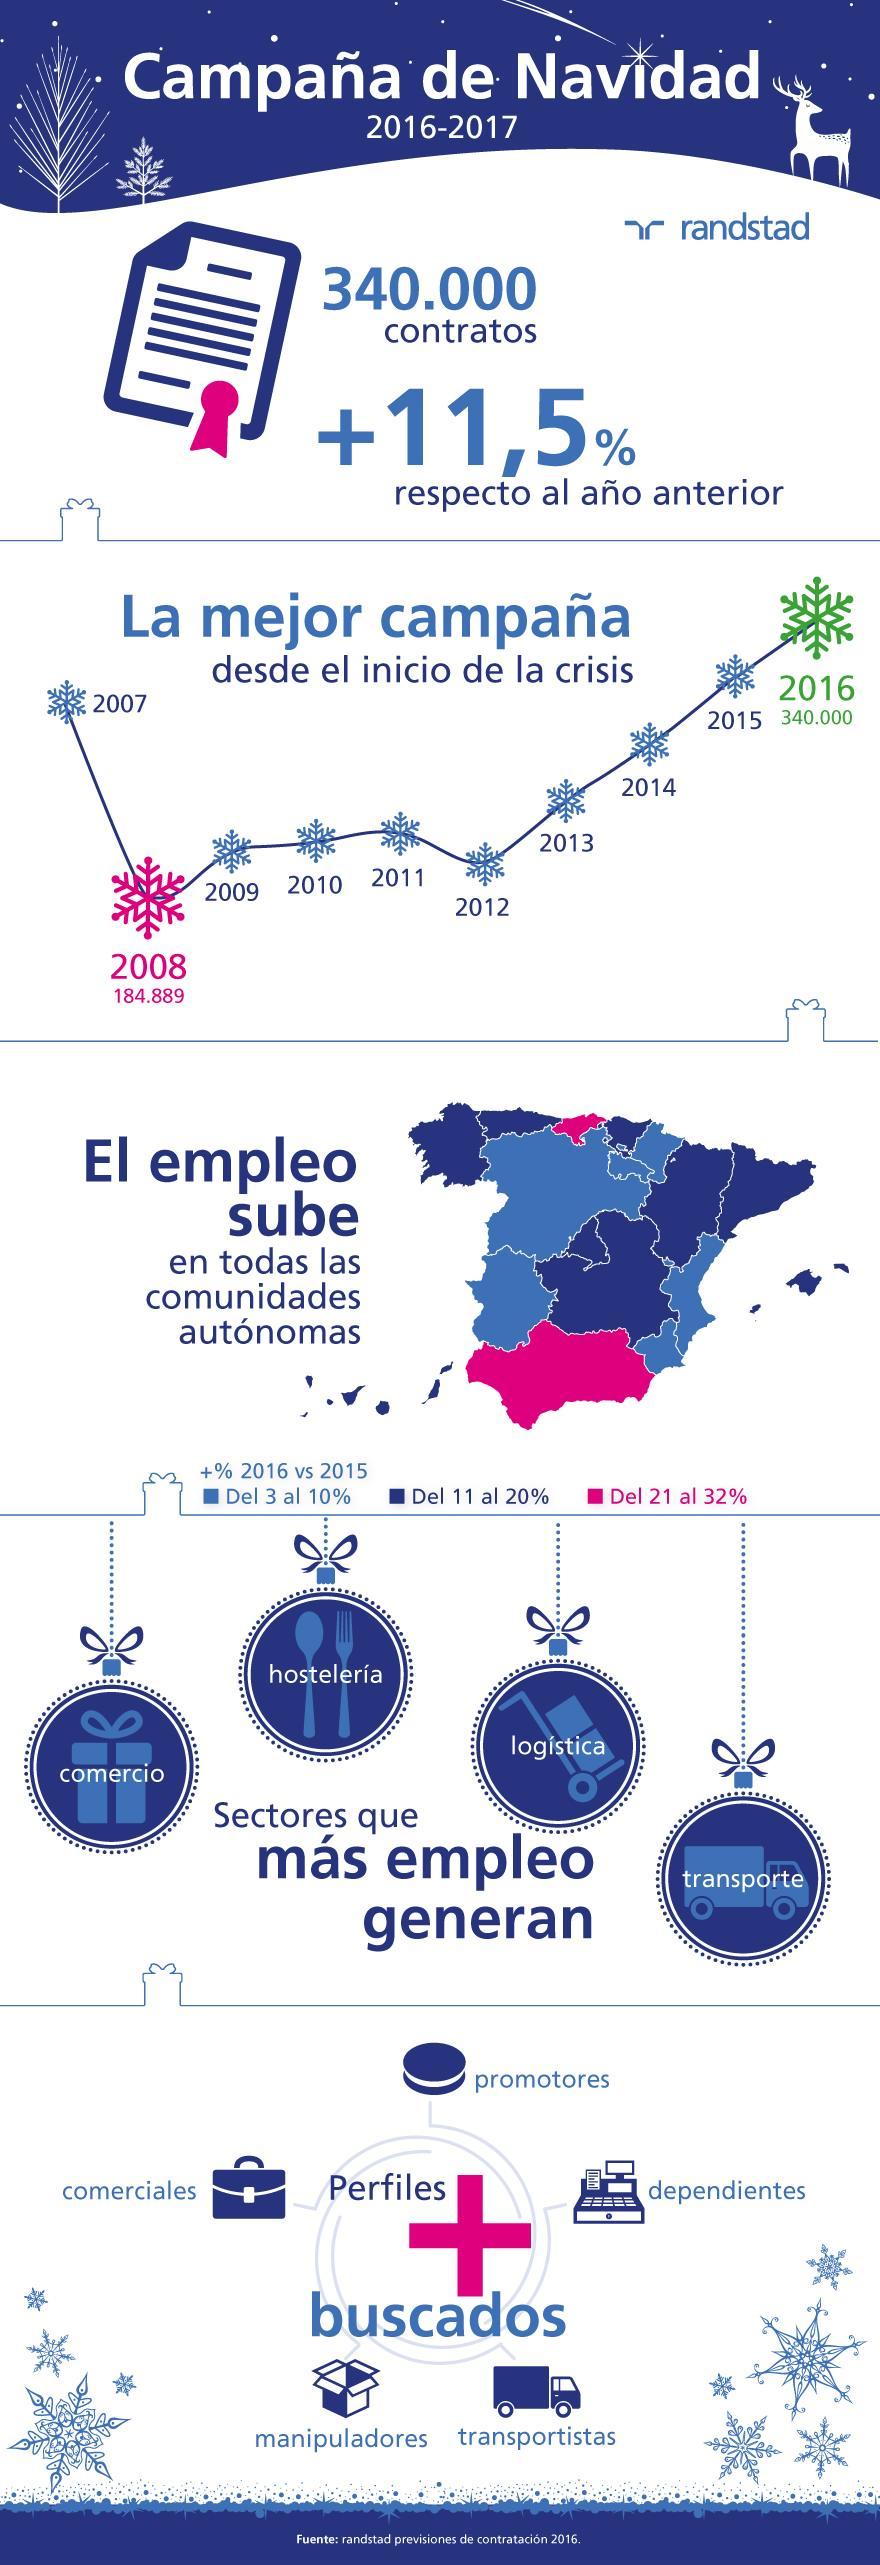 infografía previsión contratación Navidad 2016-2017